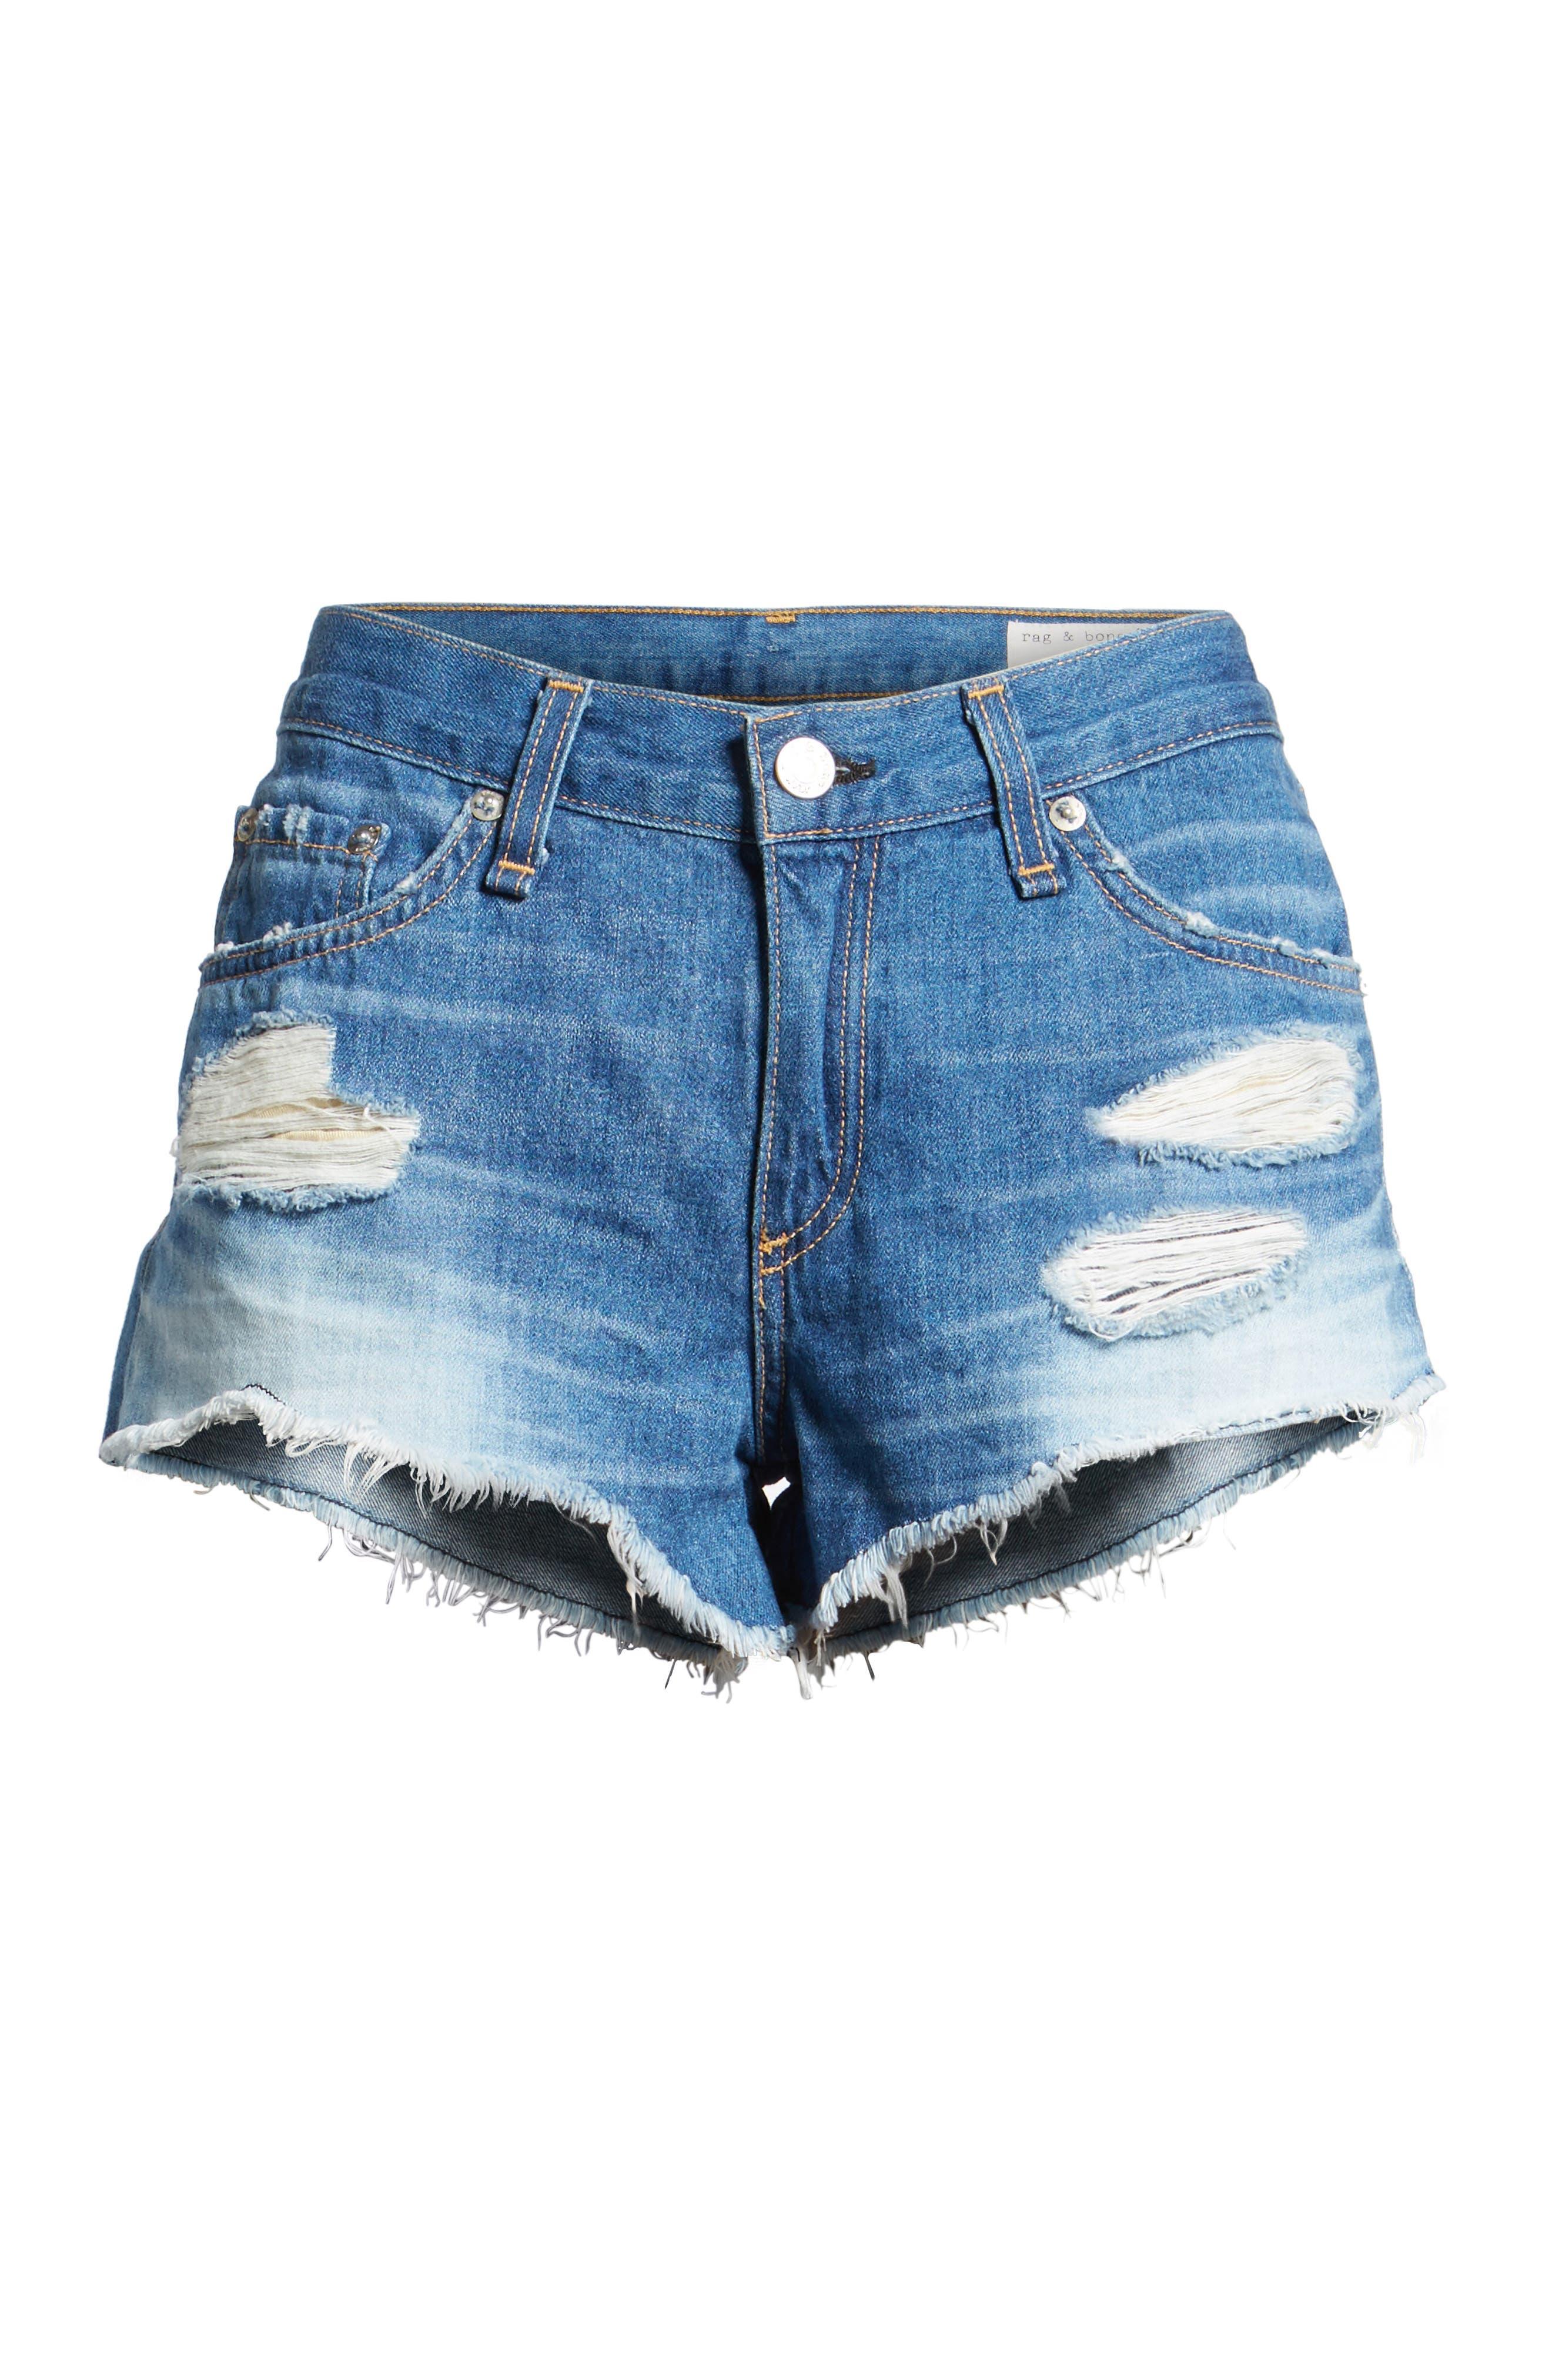 'The Cutoff' Denim Shorts, Main, color, 421